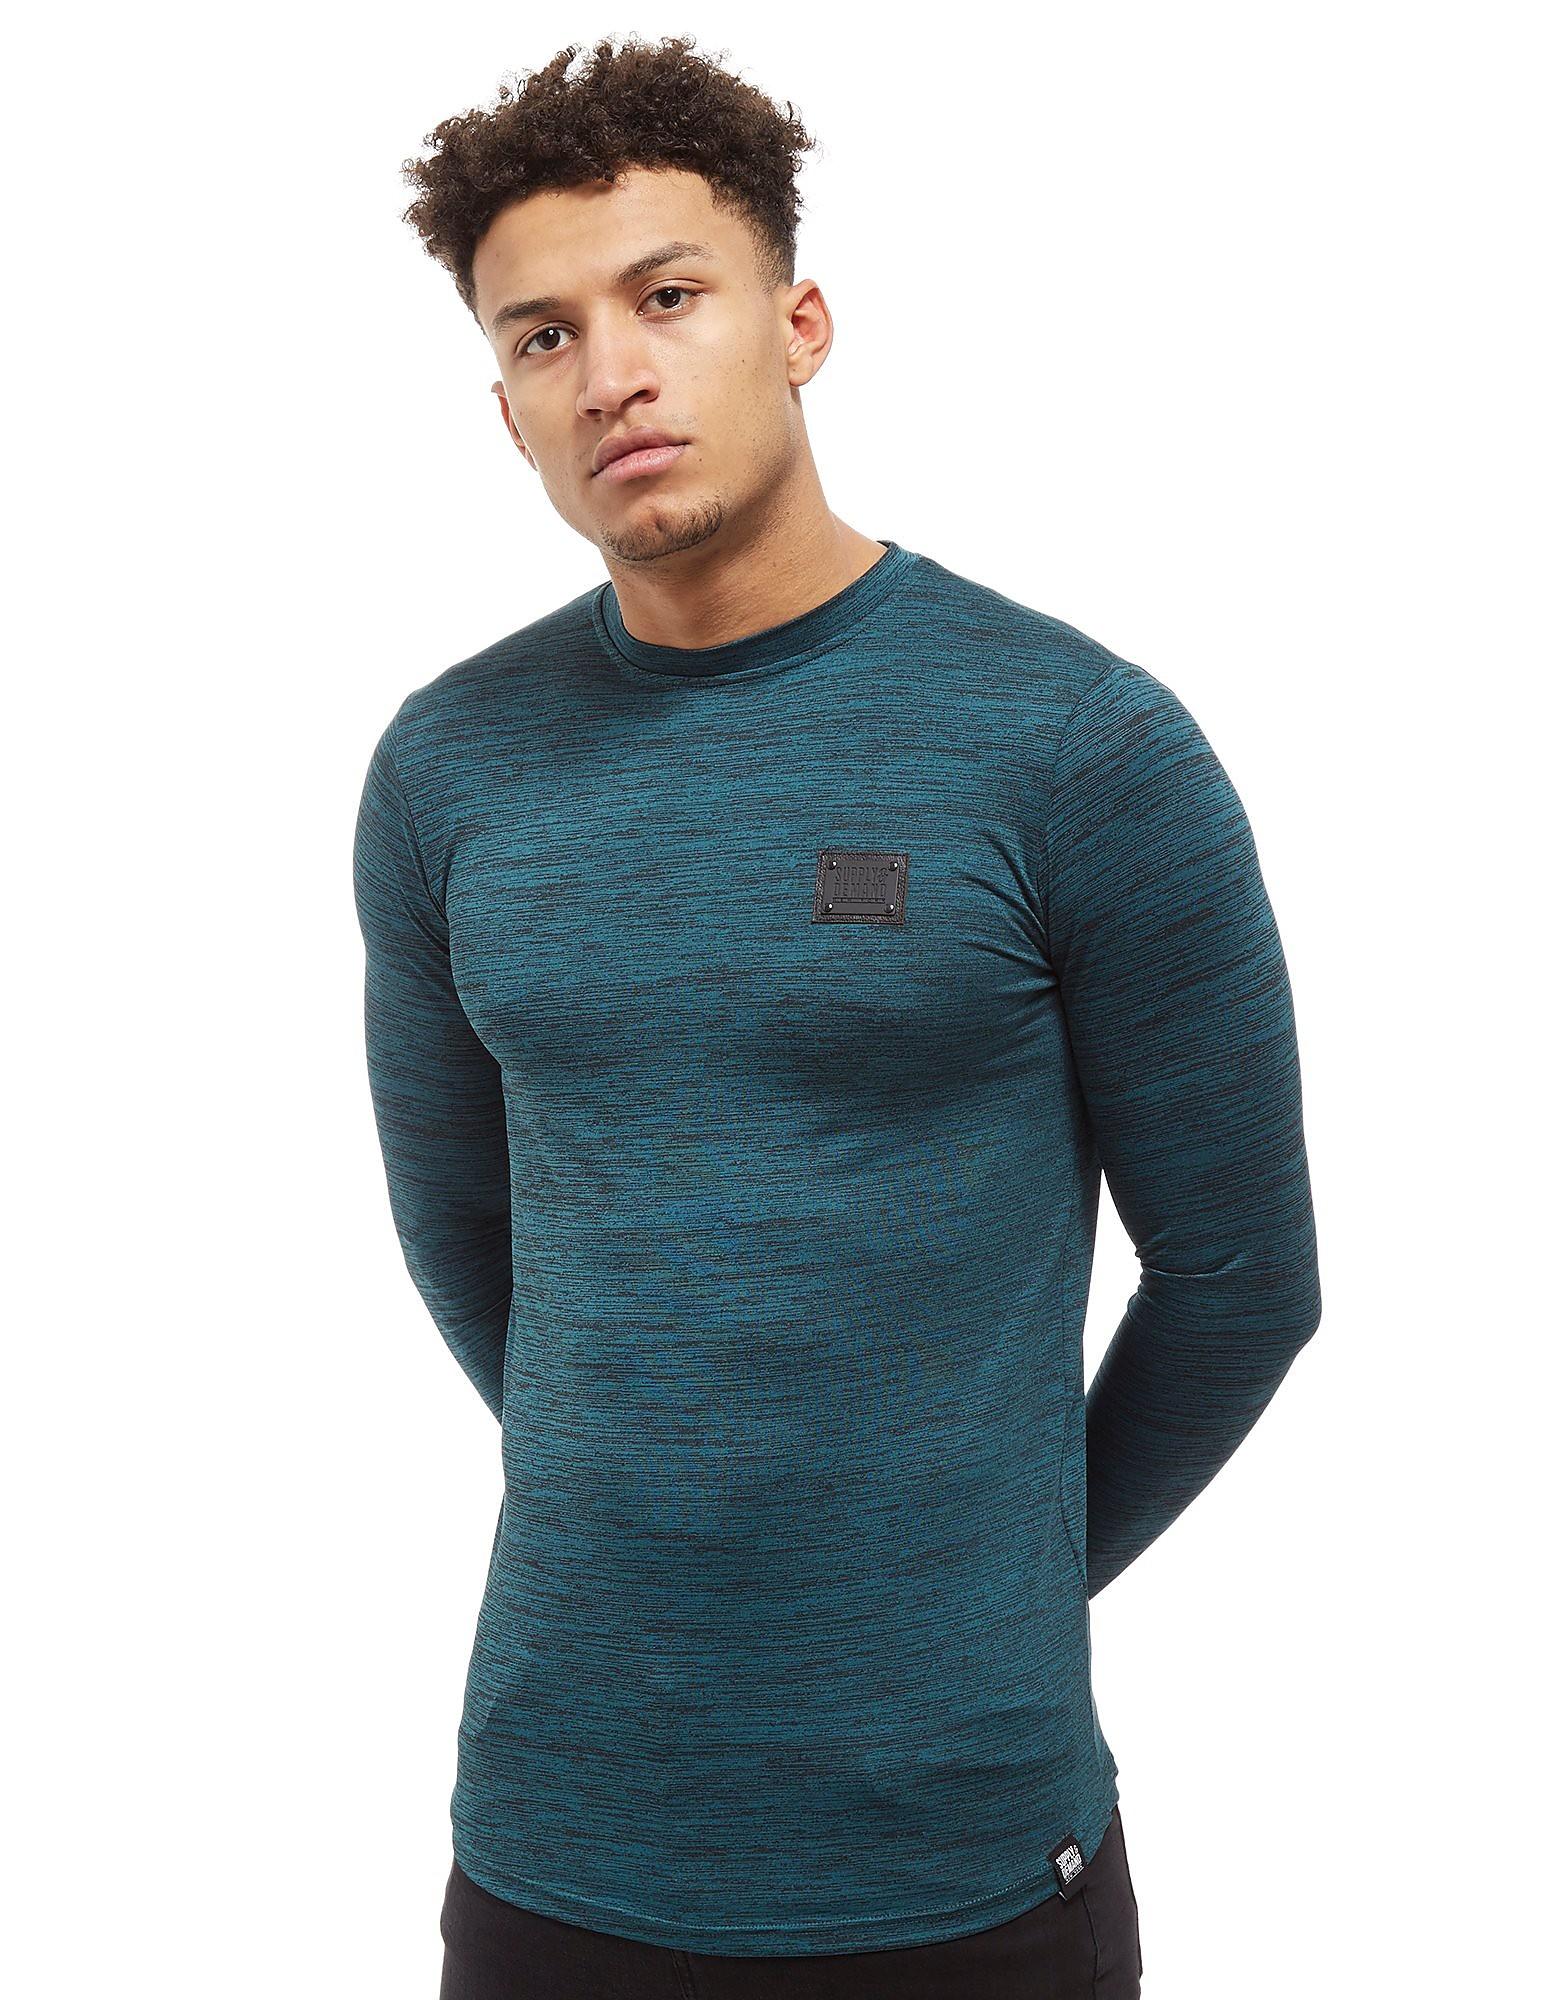 Supply & Demand Hendrick Long Sleeve T-Shirt